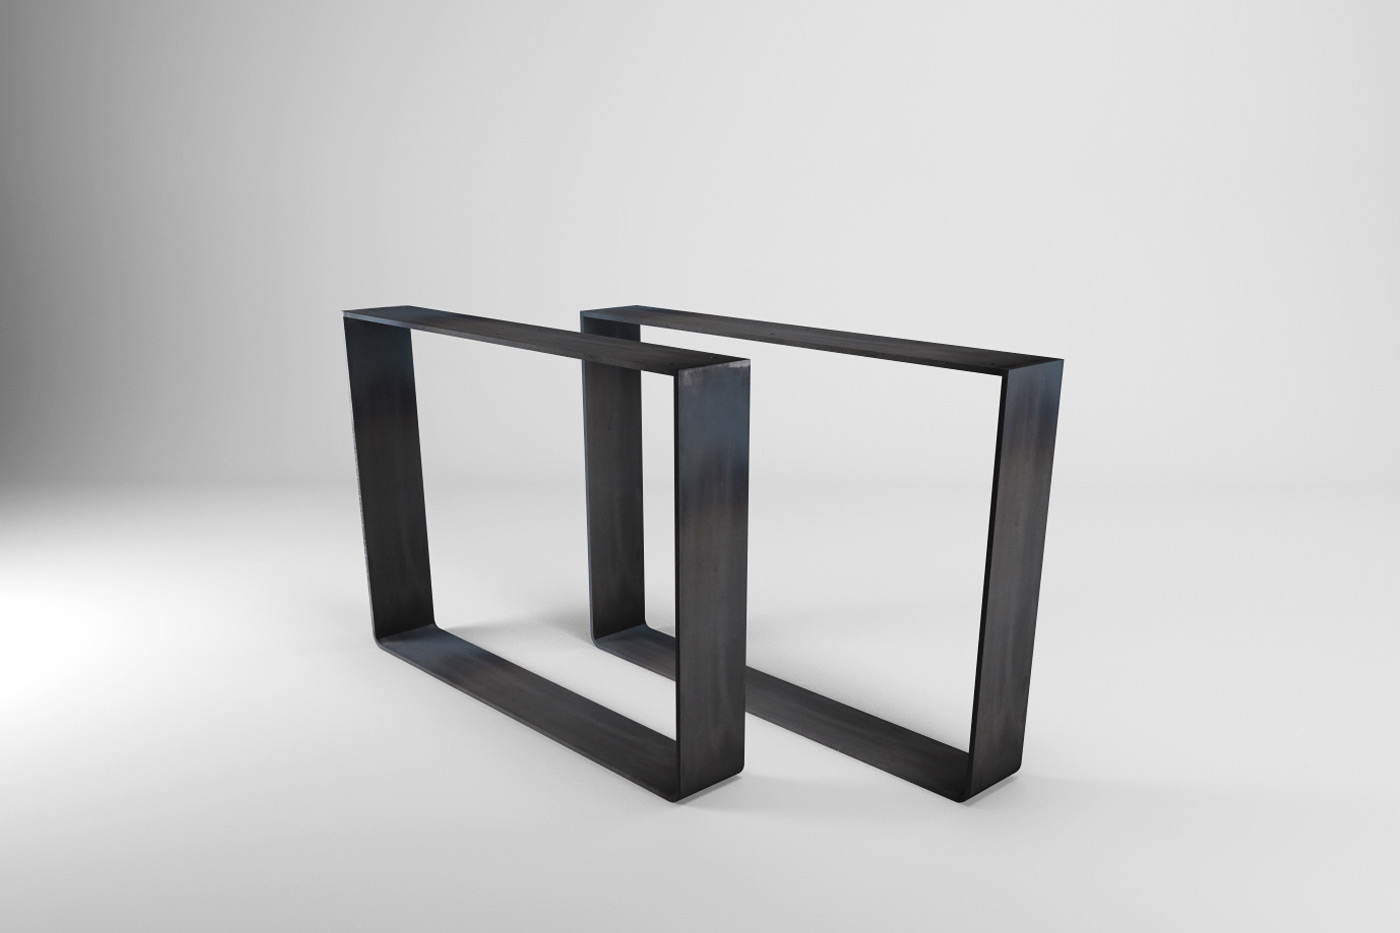 Tischgestell Stahlkufen Moss 15 Rohstahl